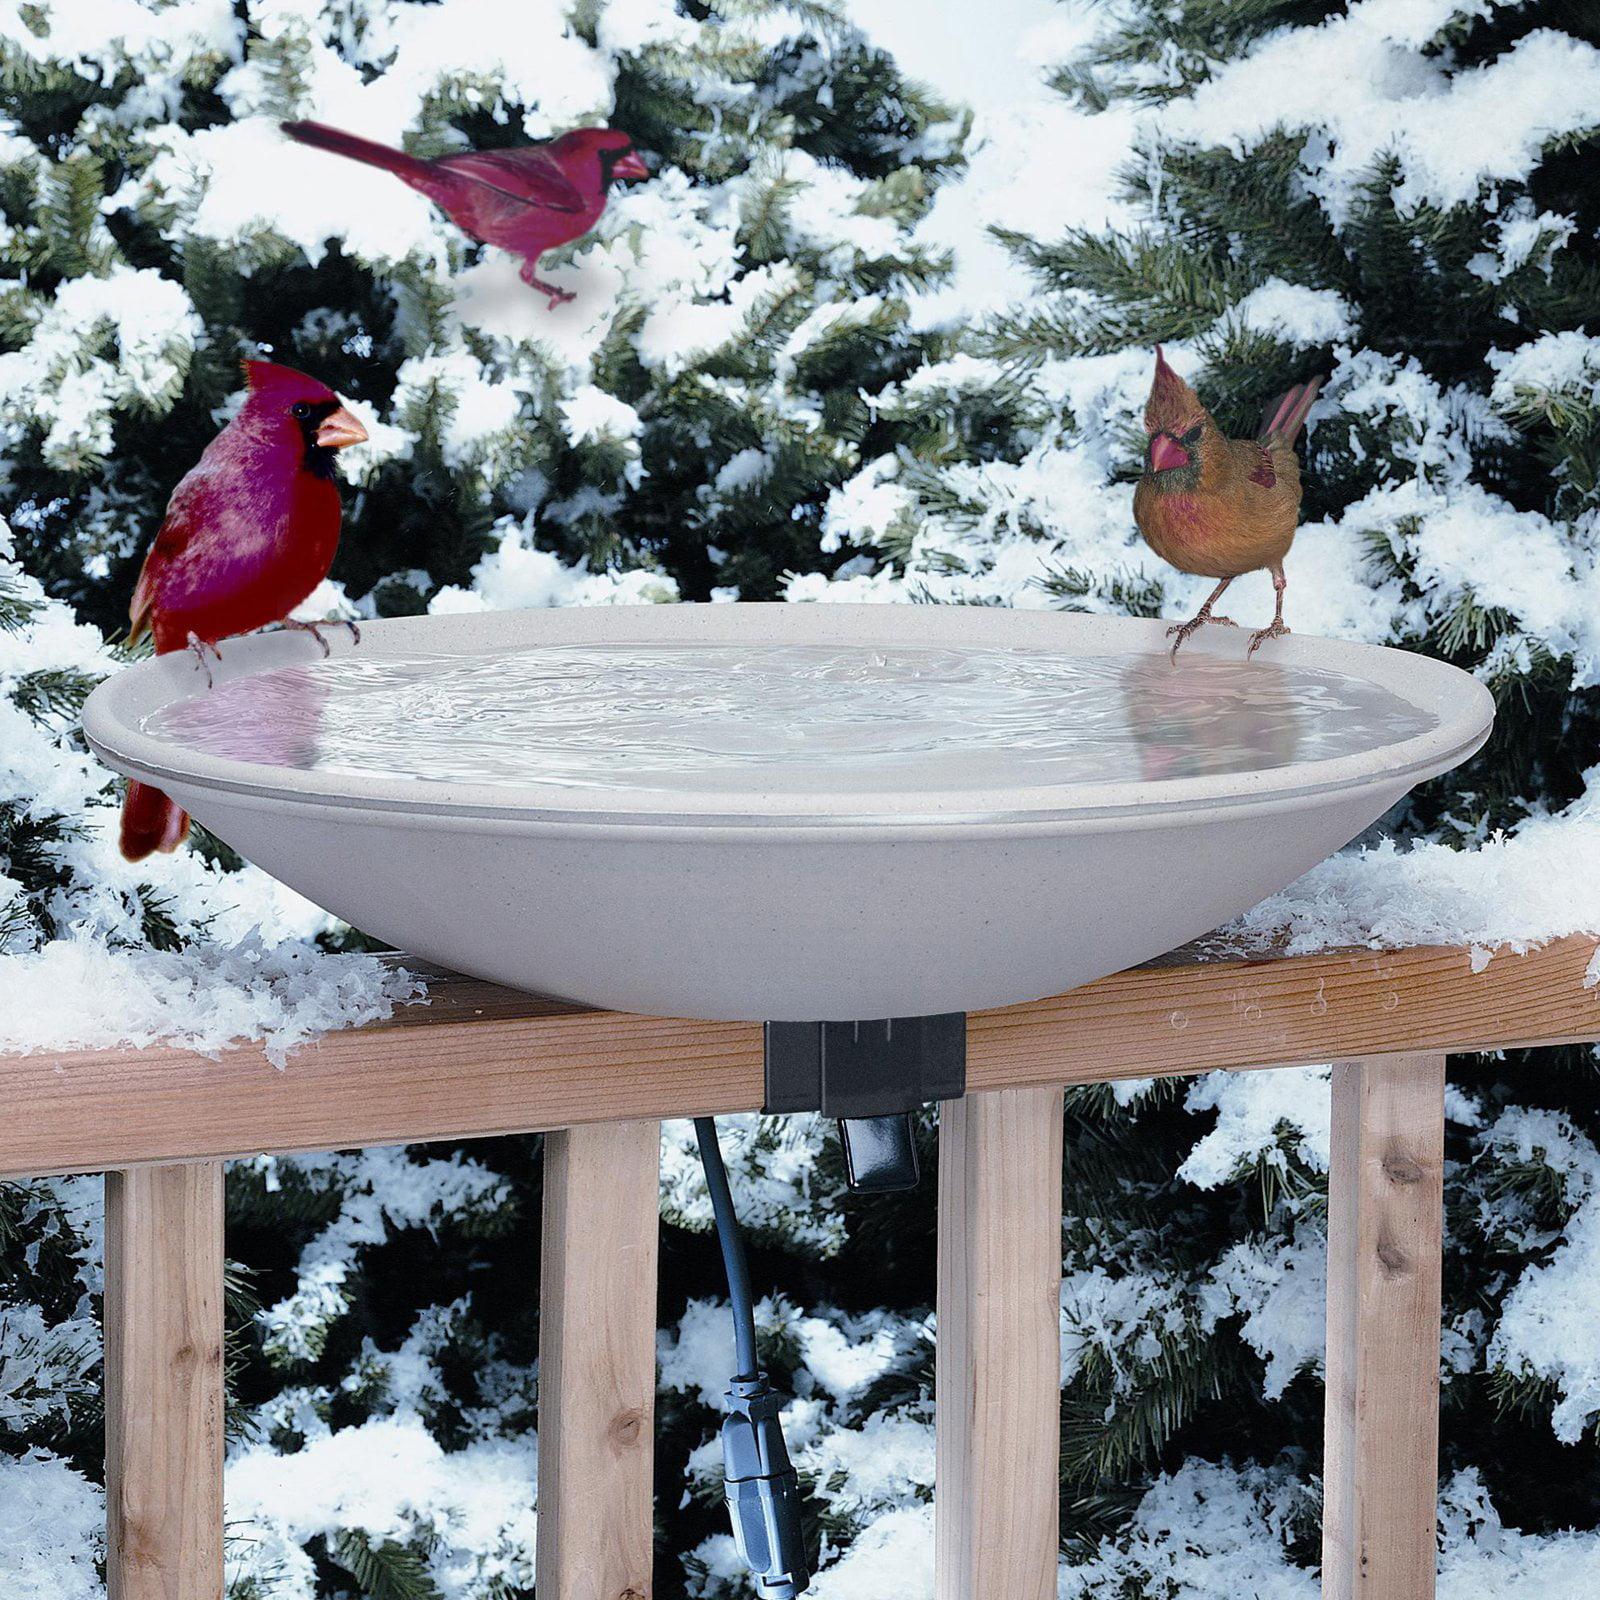 Allied Precision 20 in. EZ Deck Tilt and Clean Heated Birdbath by Gold Crest Distributing LLC